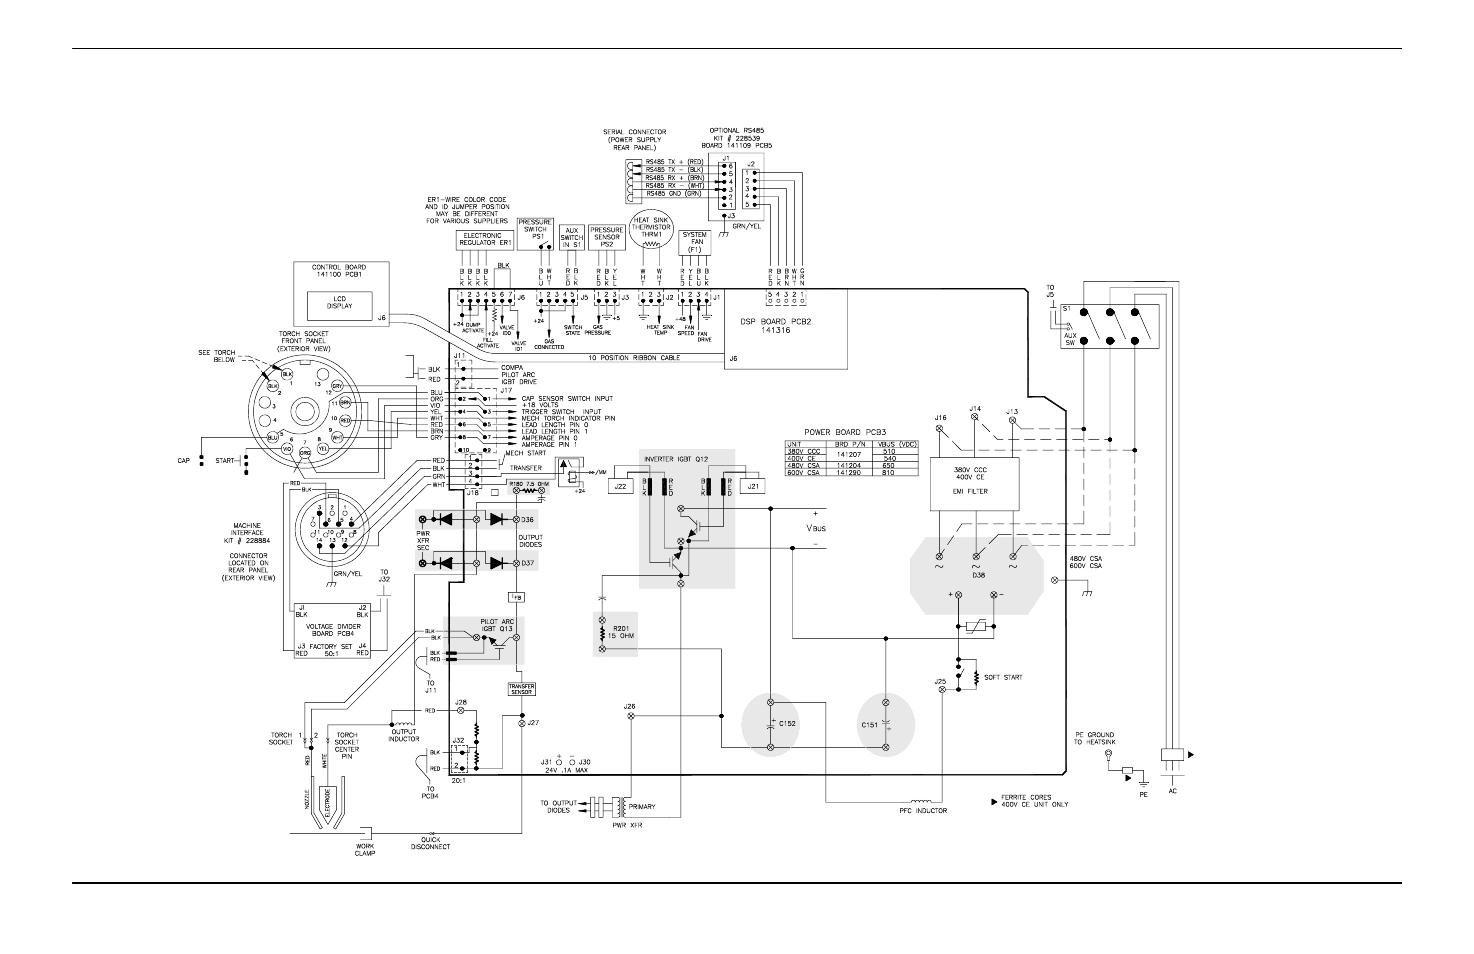 Powermax125 Schematic Diagram  S Closed  See